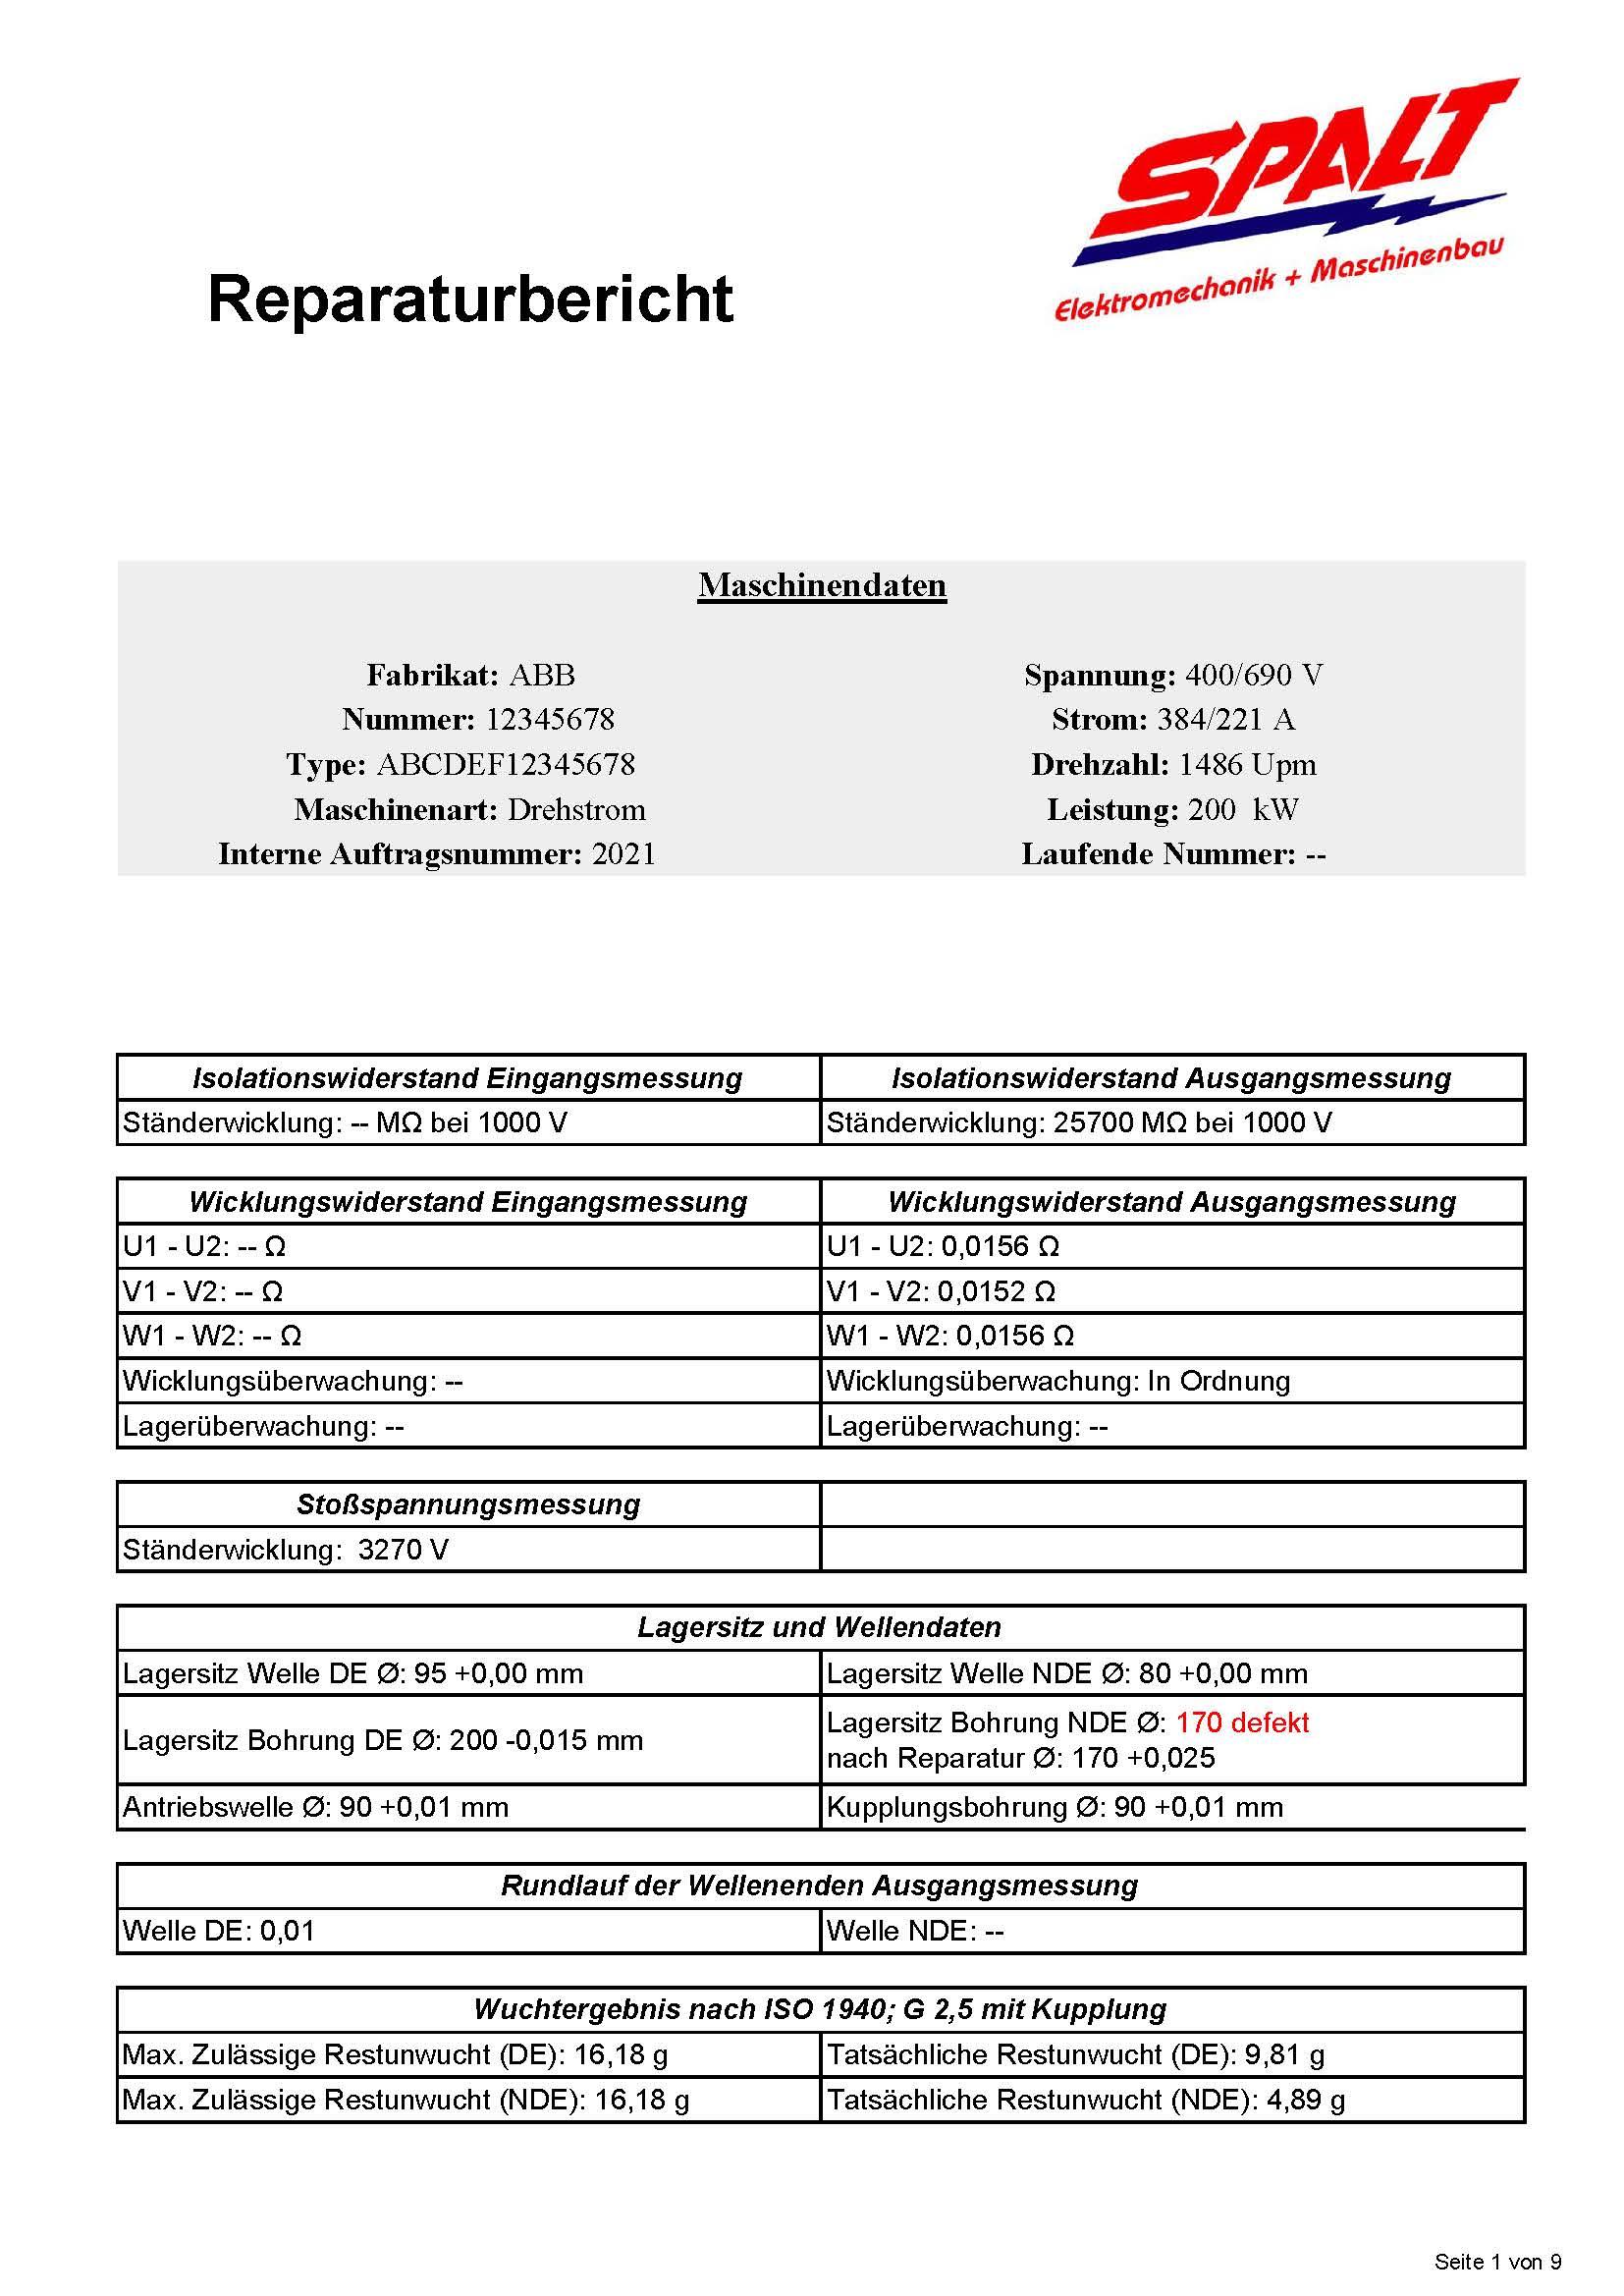 Reparaturbericht Drehstrommotor (002)_Seite_1